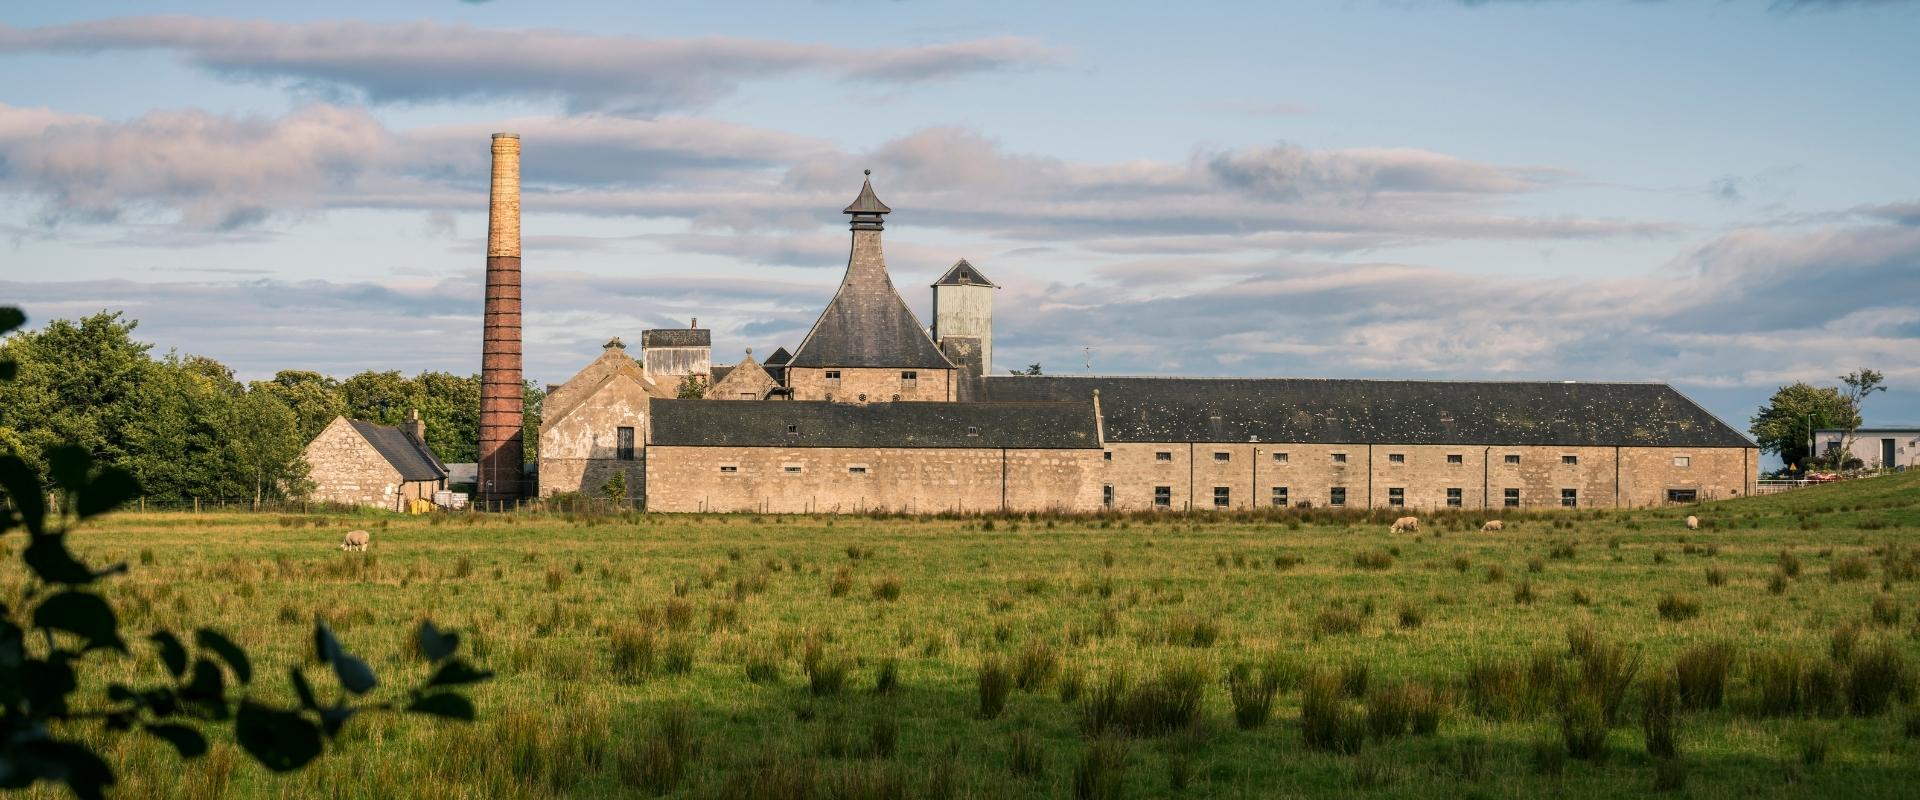 Brora Distillery